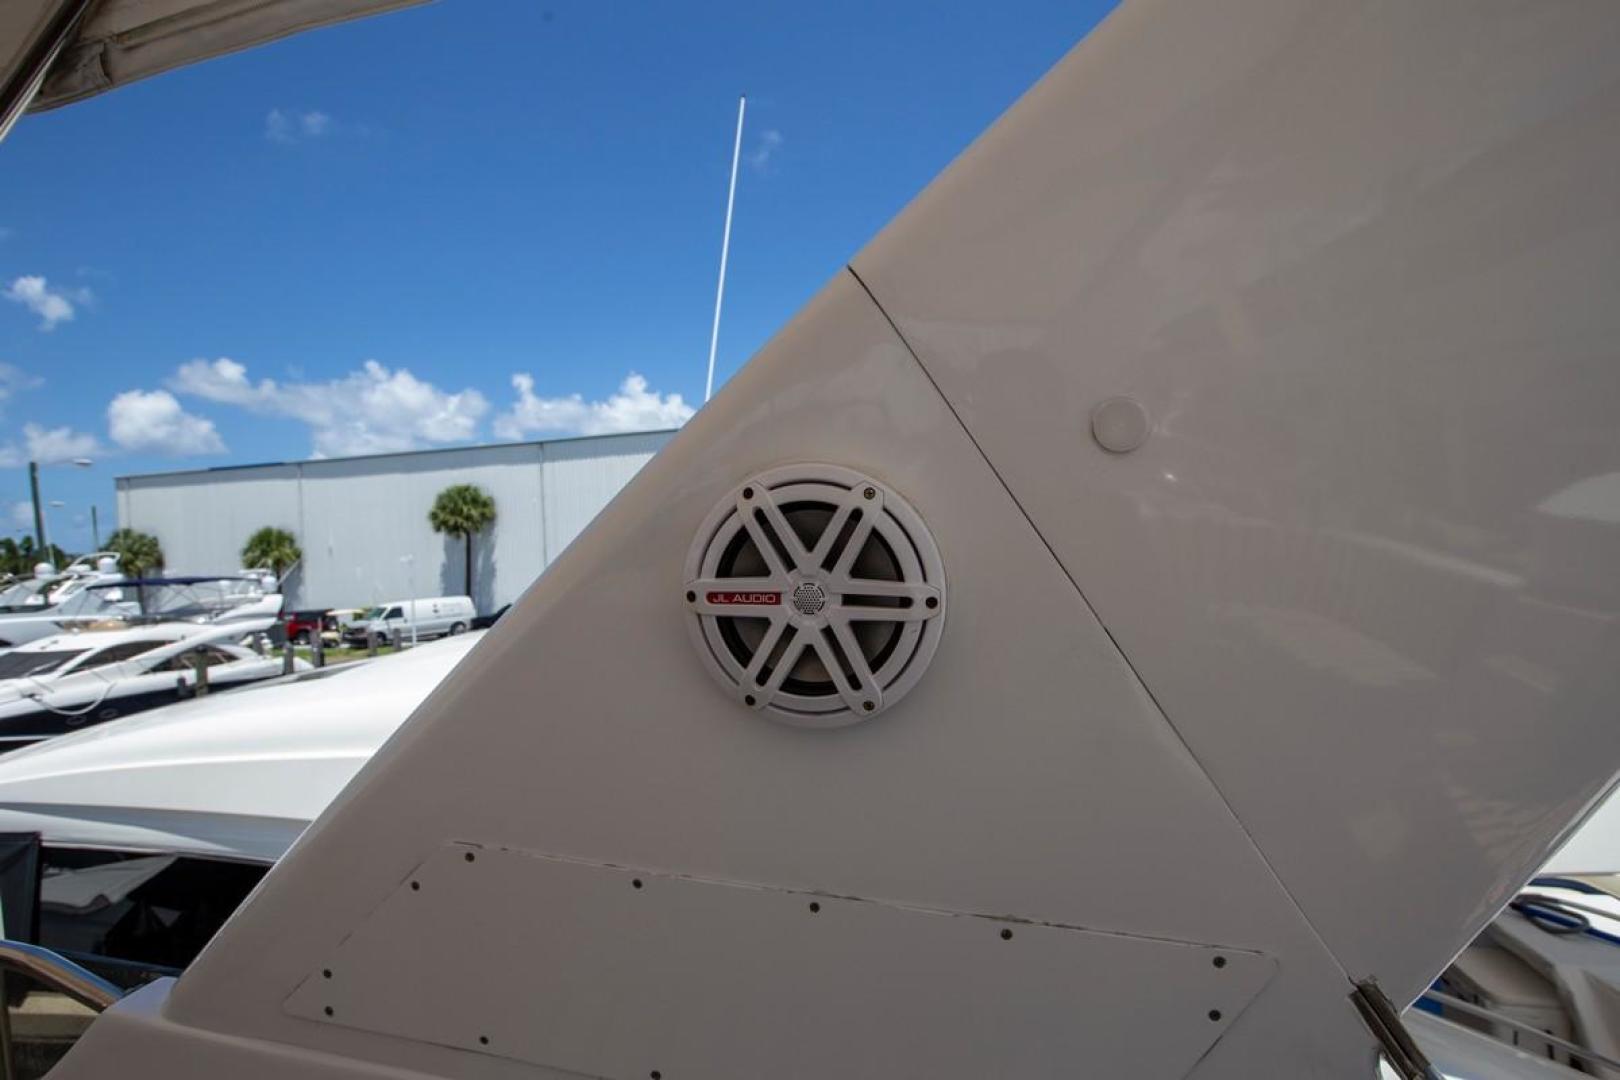 Hatteras-Cockpit Motor Yacht 2000-Getaway Ft. Lauderdale-Florida-United States-977404 | Thumbnail